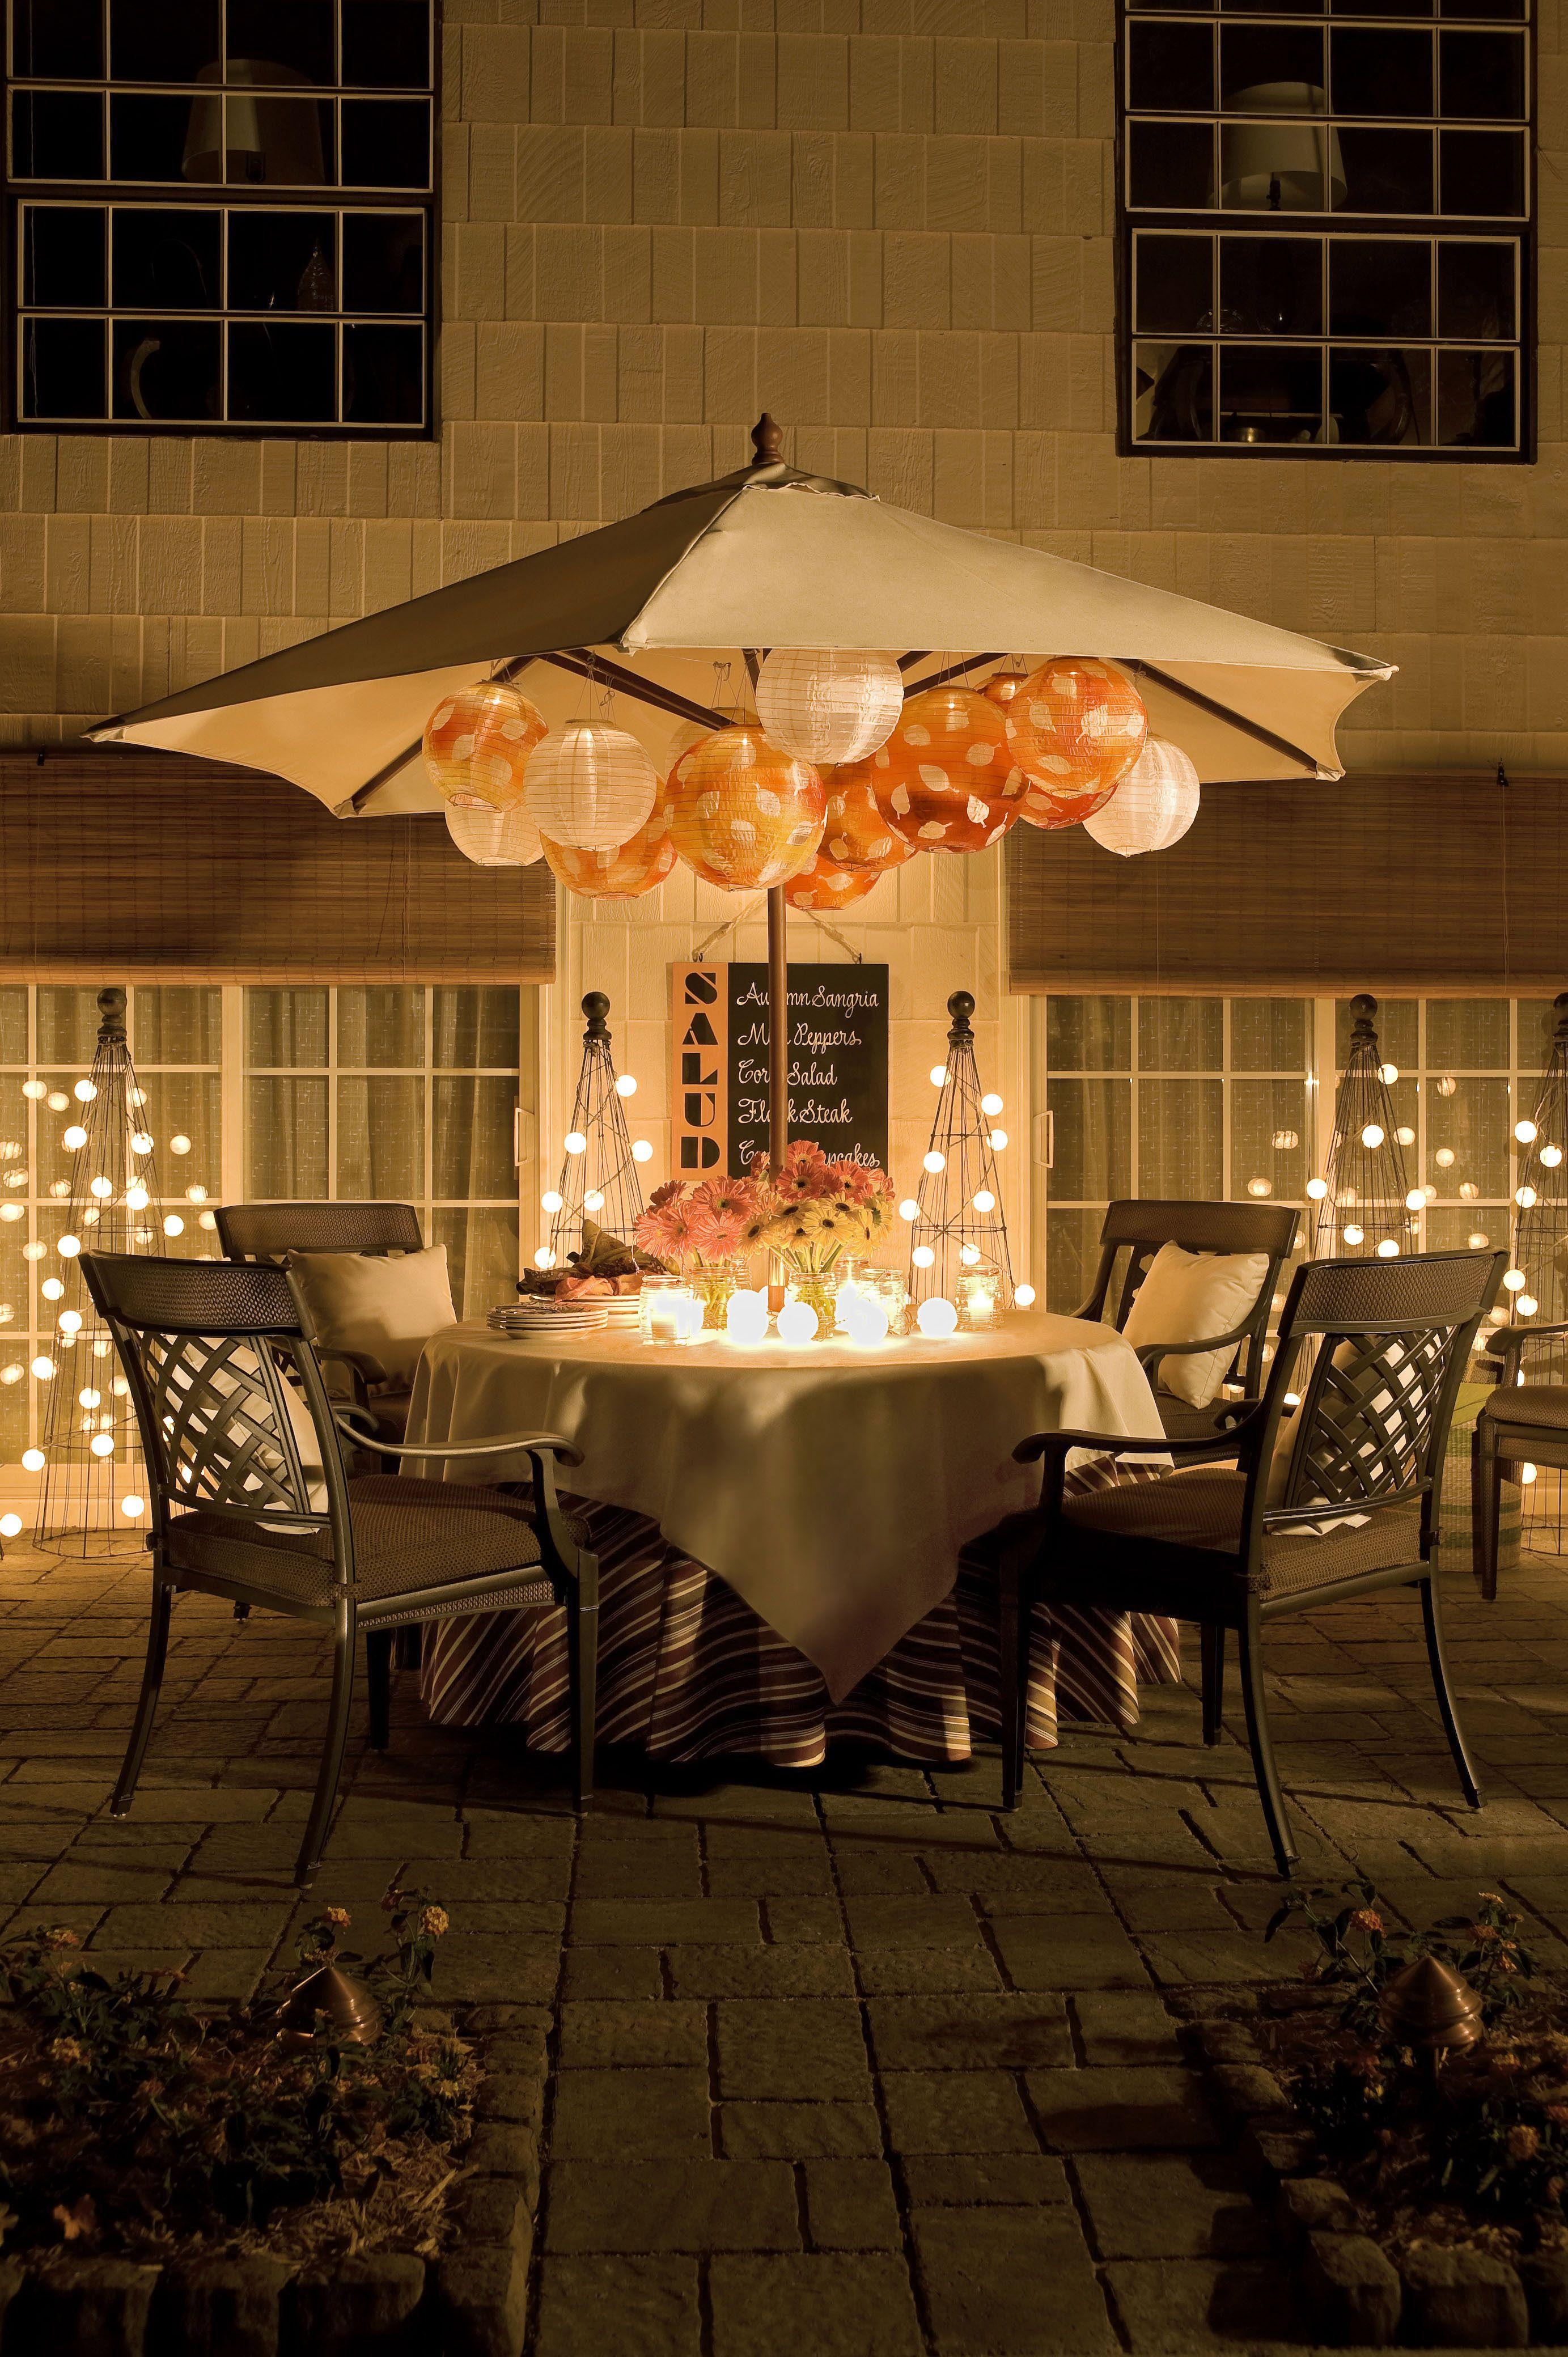 Pin By Lowe S On Savor Summer Diy Outdoor Lighting Patio Umbrellas Solar Patio Lights